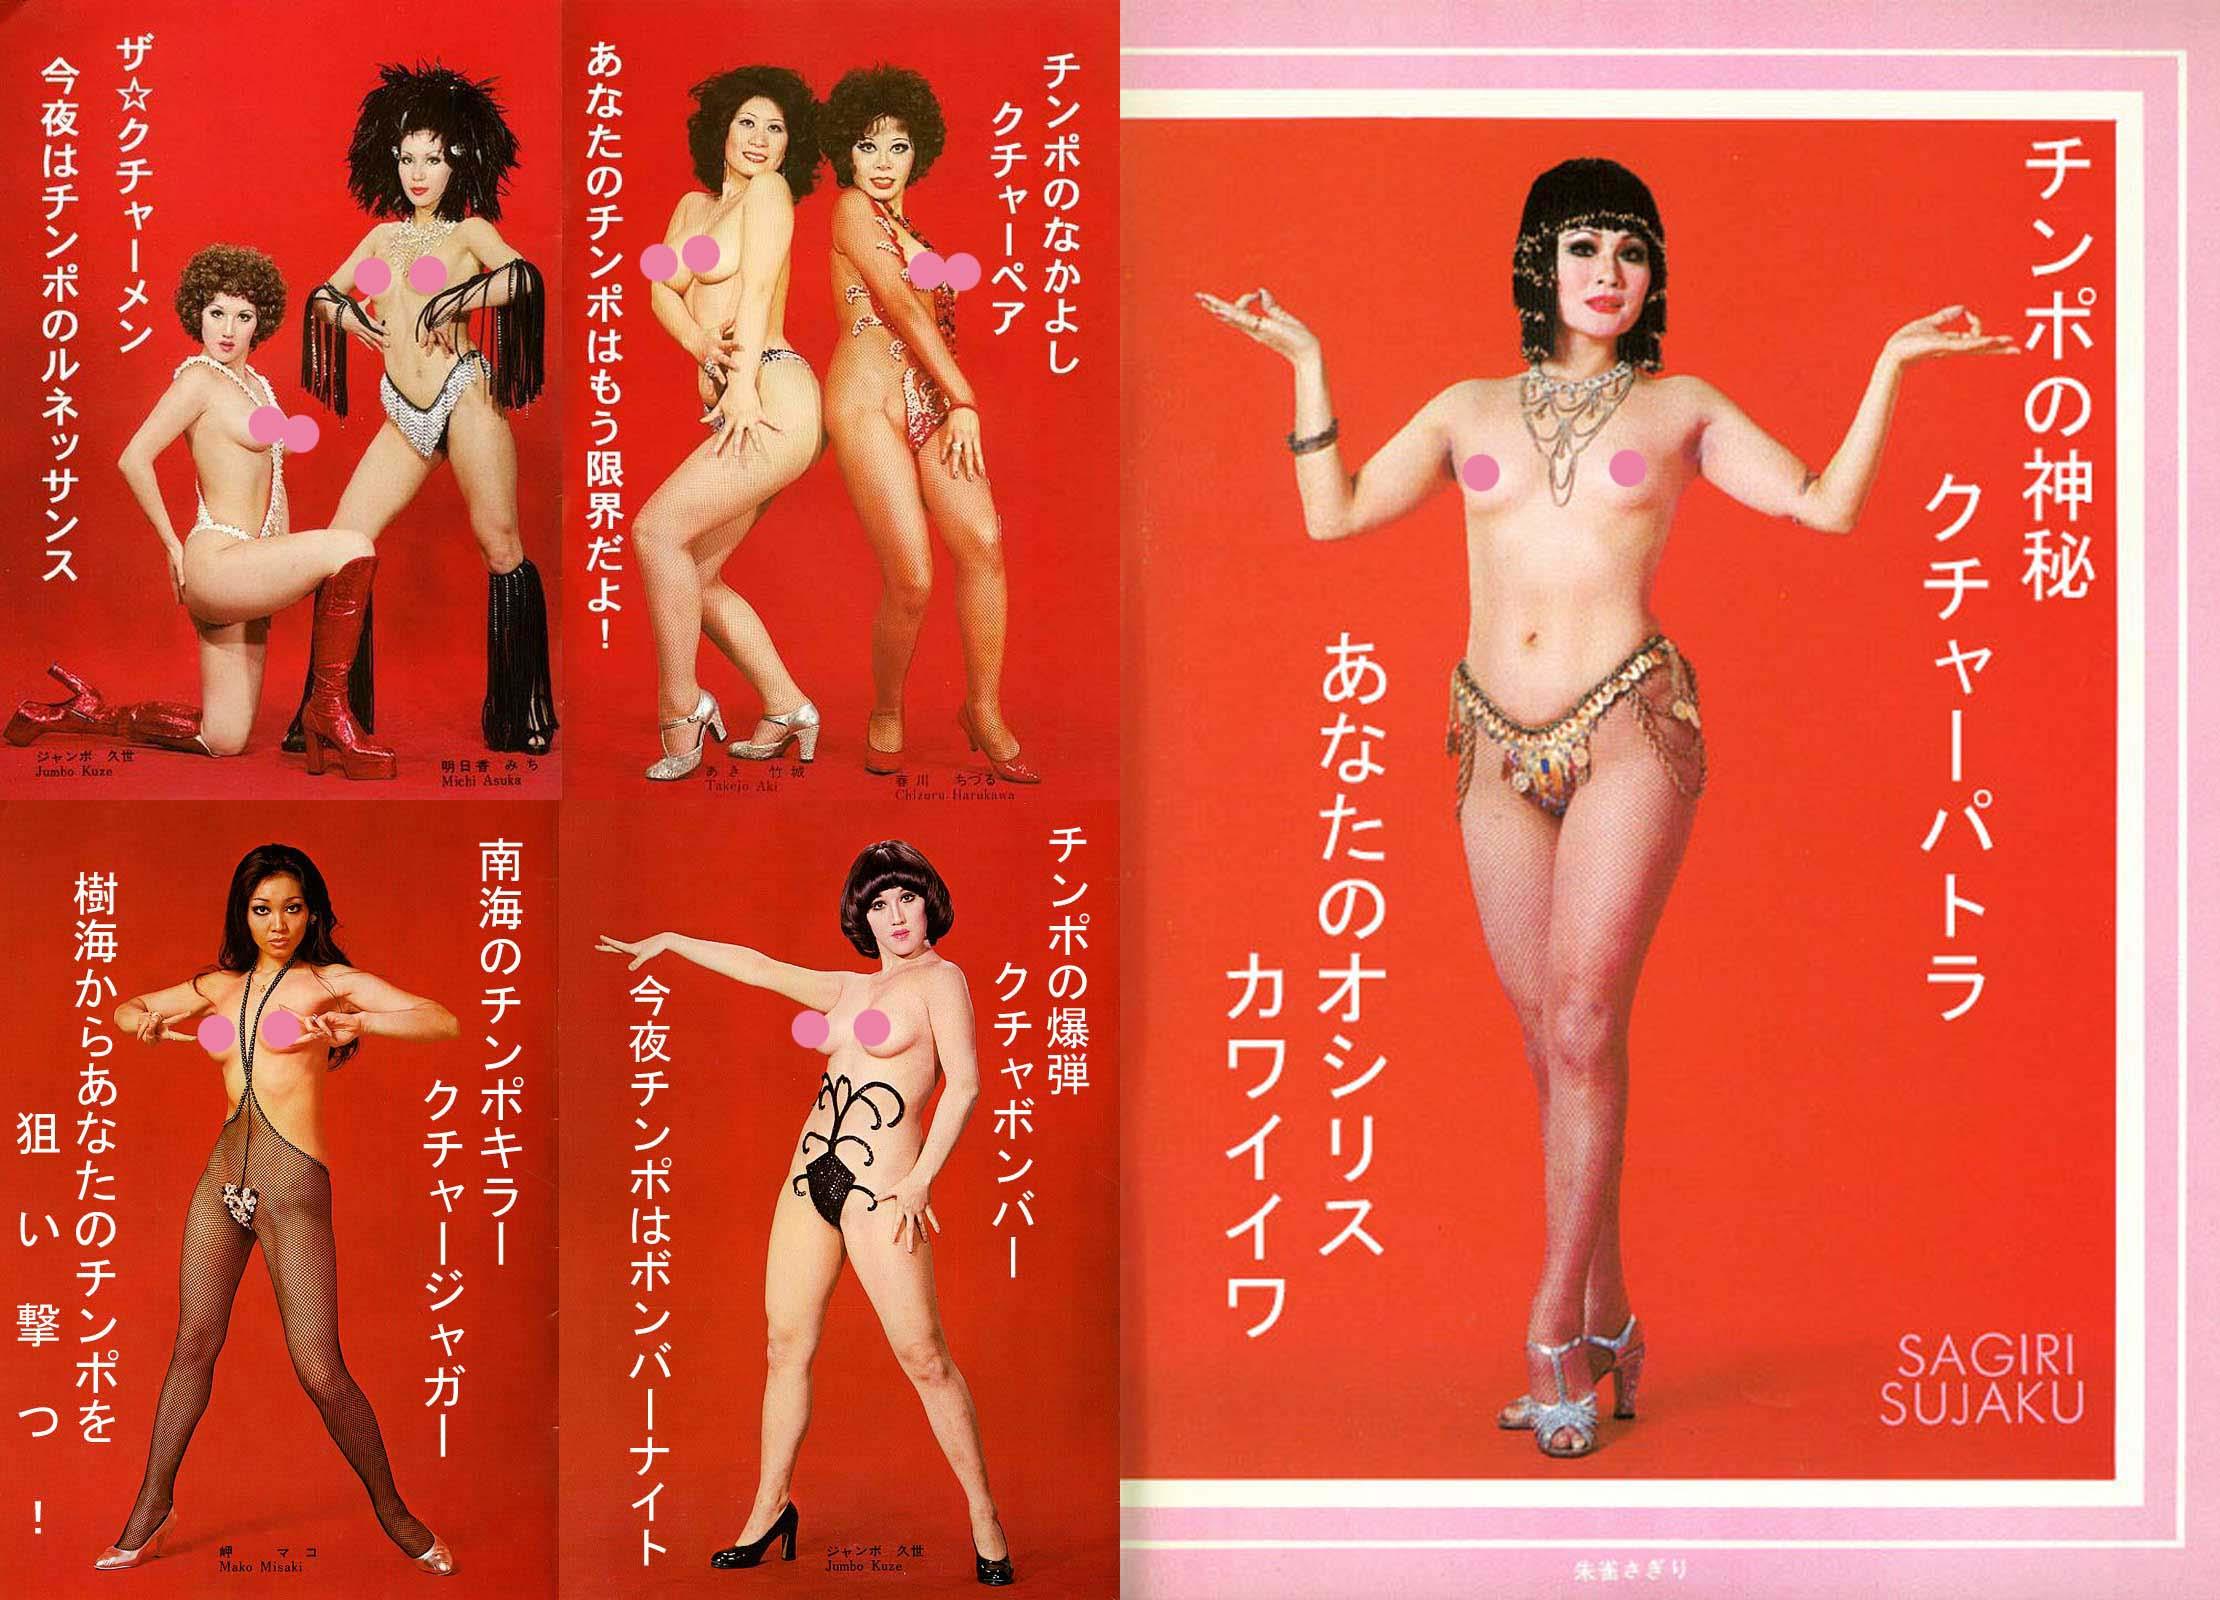 http://livedoor.2.blogimg.jp/hisabisaniwarota/imgs/8/5/85b3c5ff.jpg